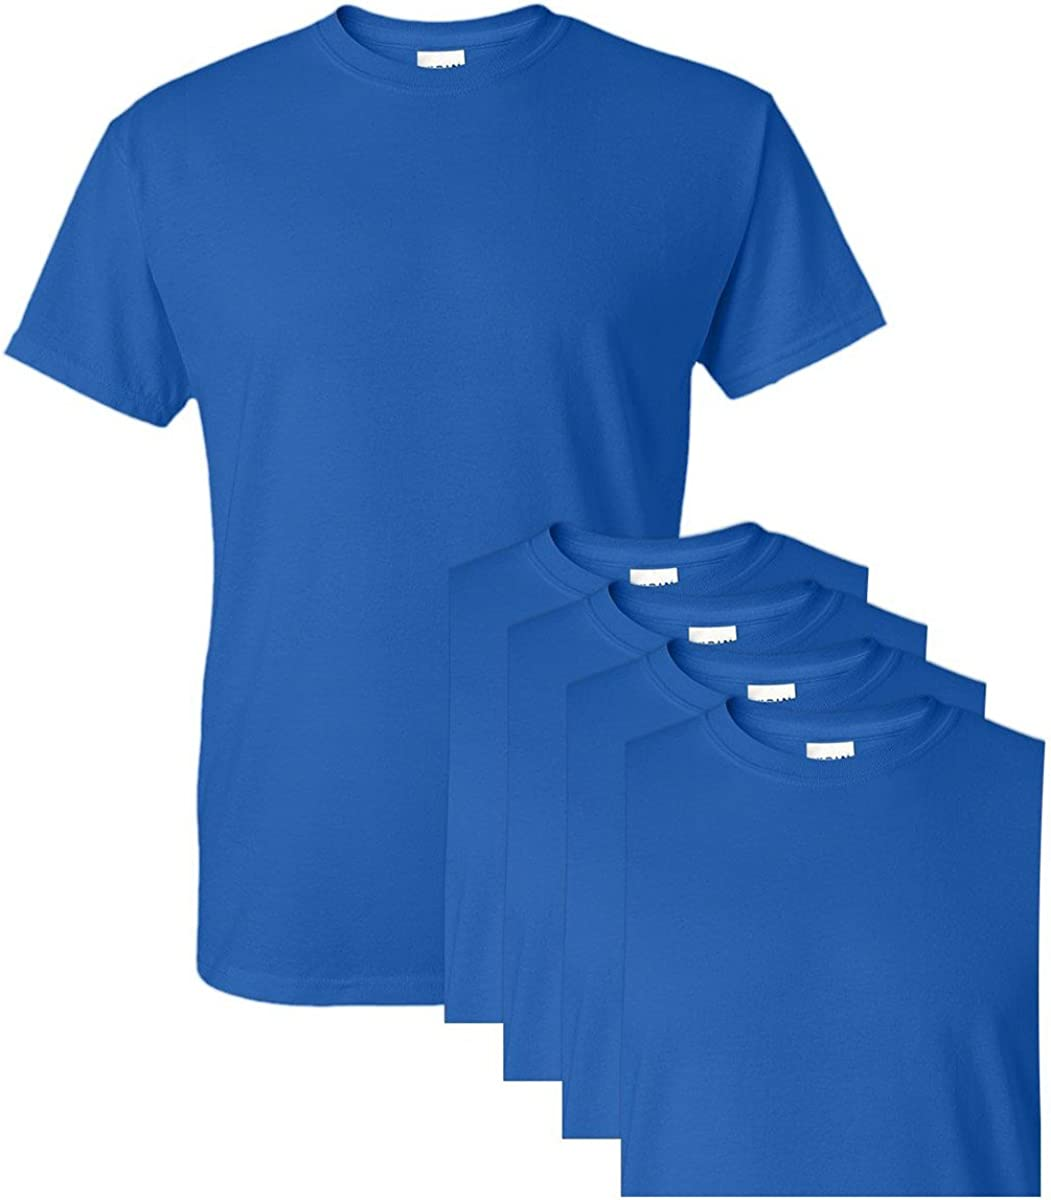 Gildan G8000 50% Cotton 50% Polyester DryBlend T-Shirt Royal Medium 5 Pack